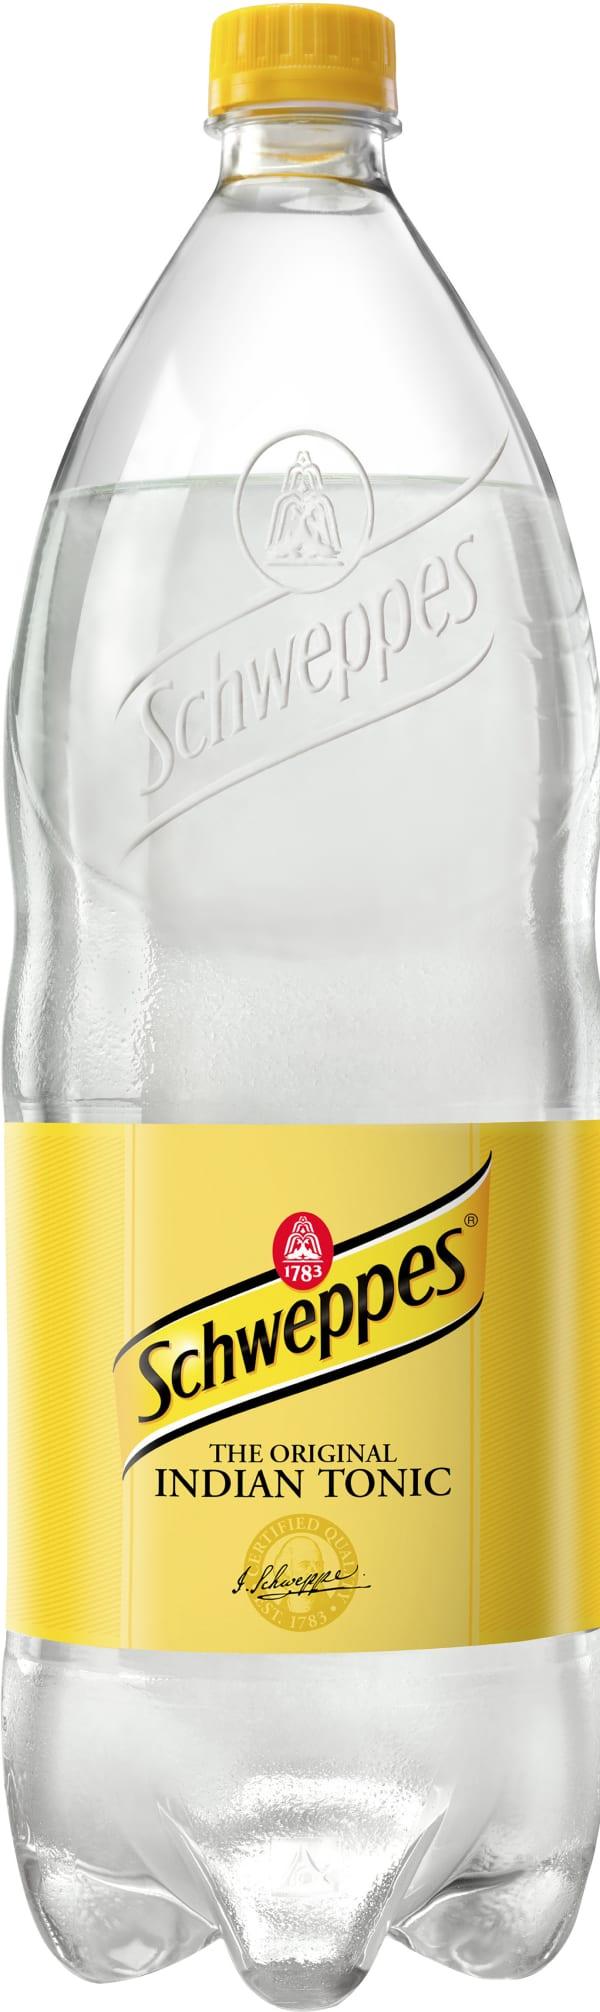 Schweppes Indian Tonic Water plastic bottle